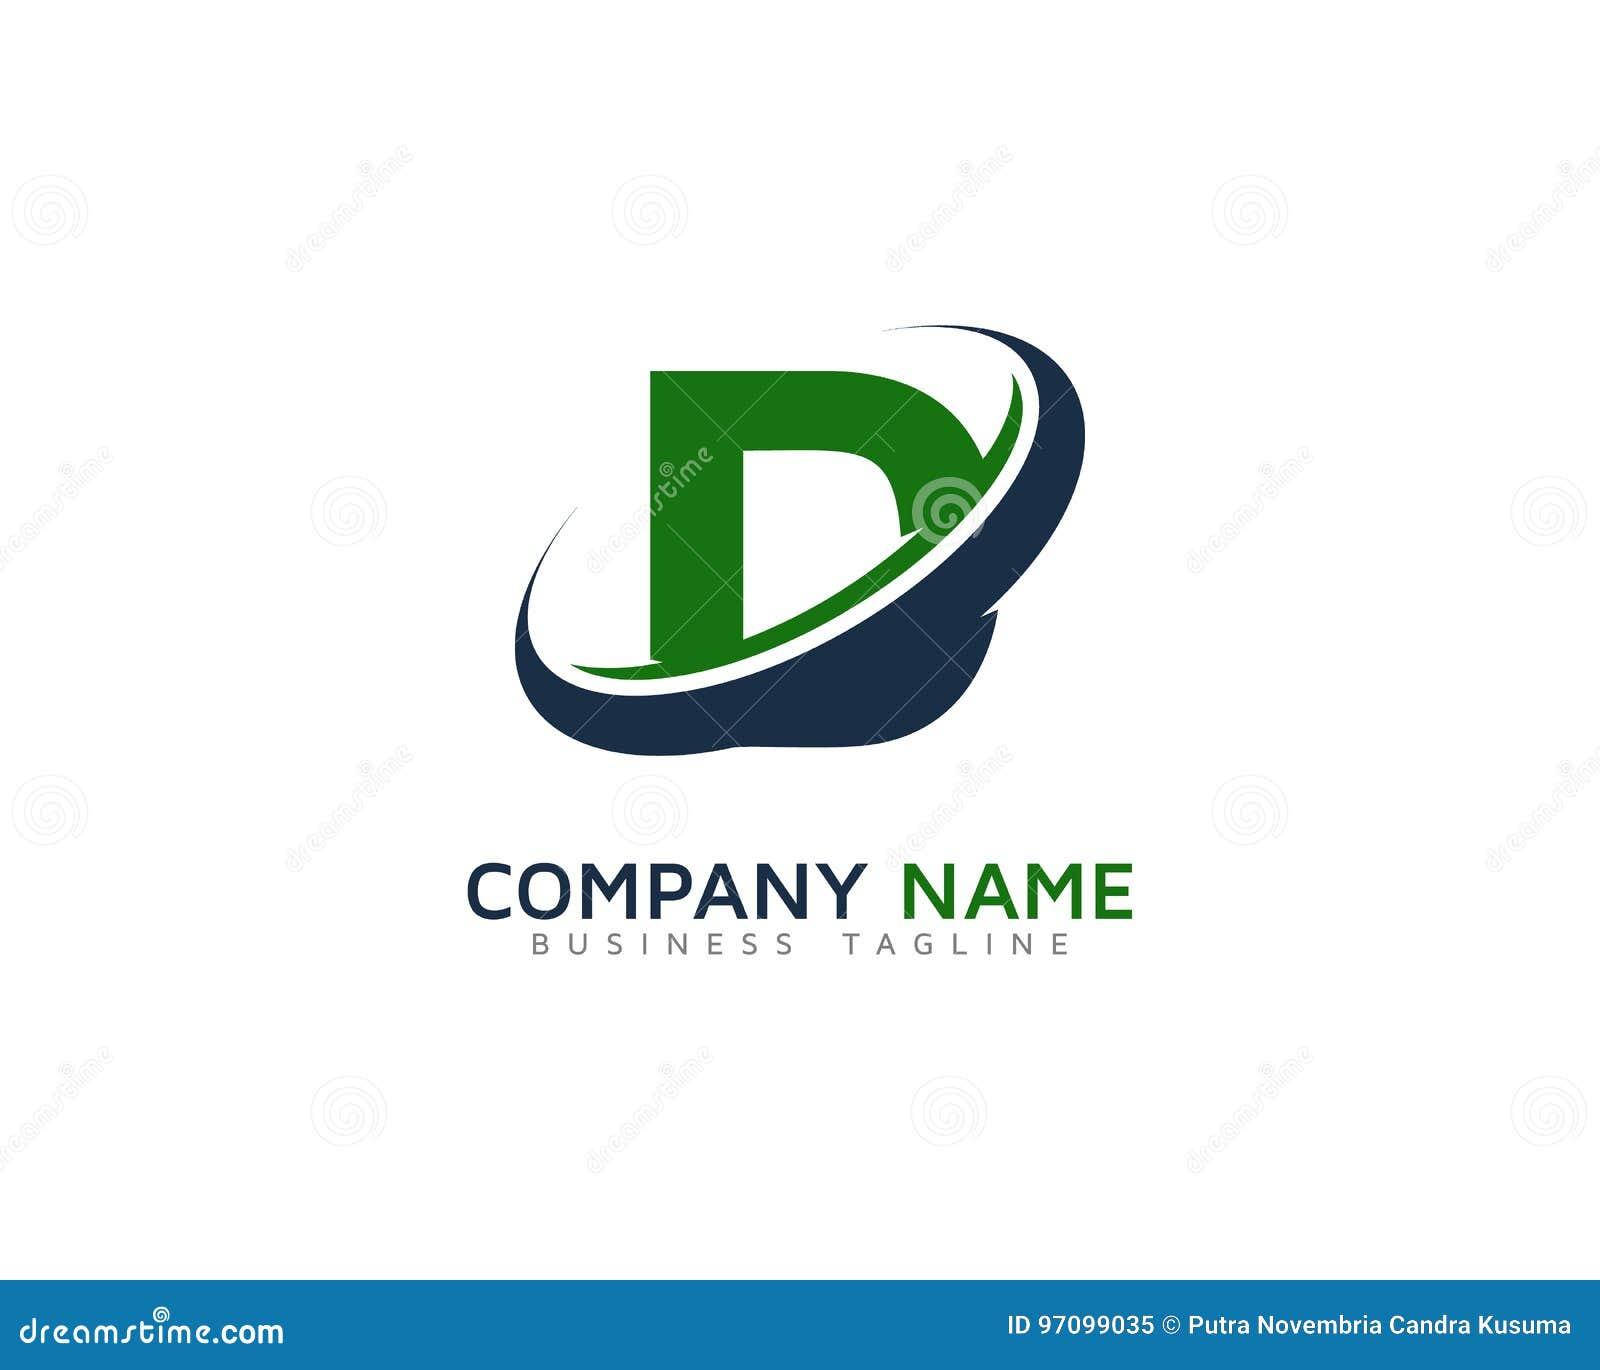 Enement Letter | Ring Letter With Swoosh Icon Logo Design Element Vektor Abbildung